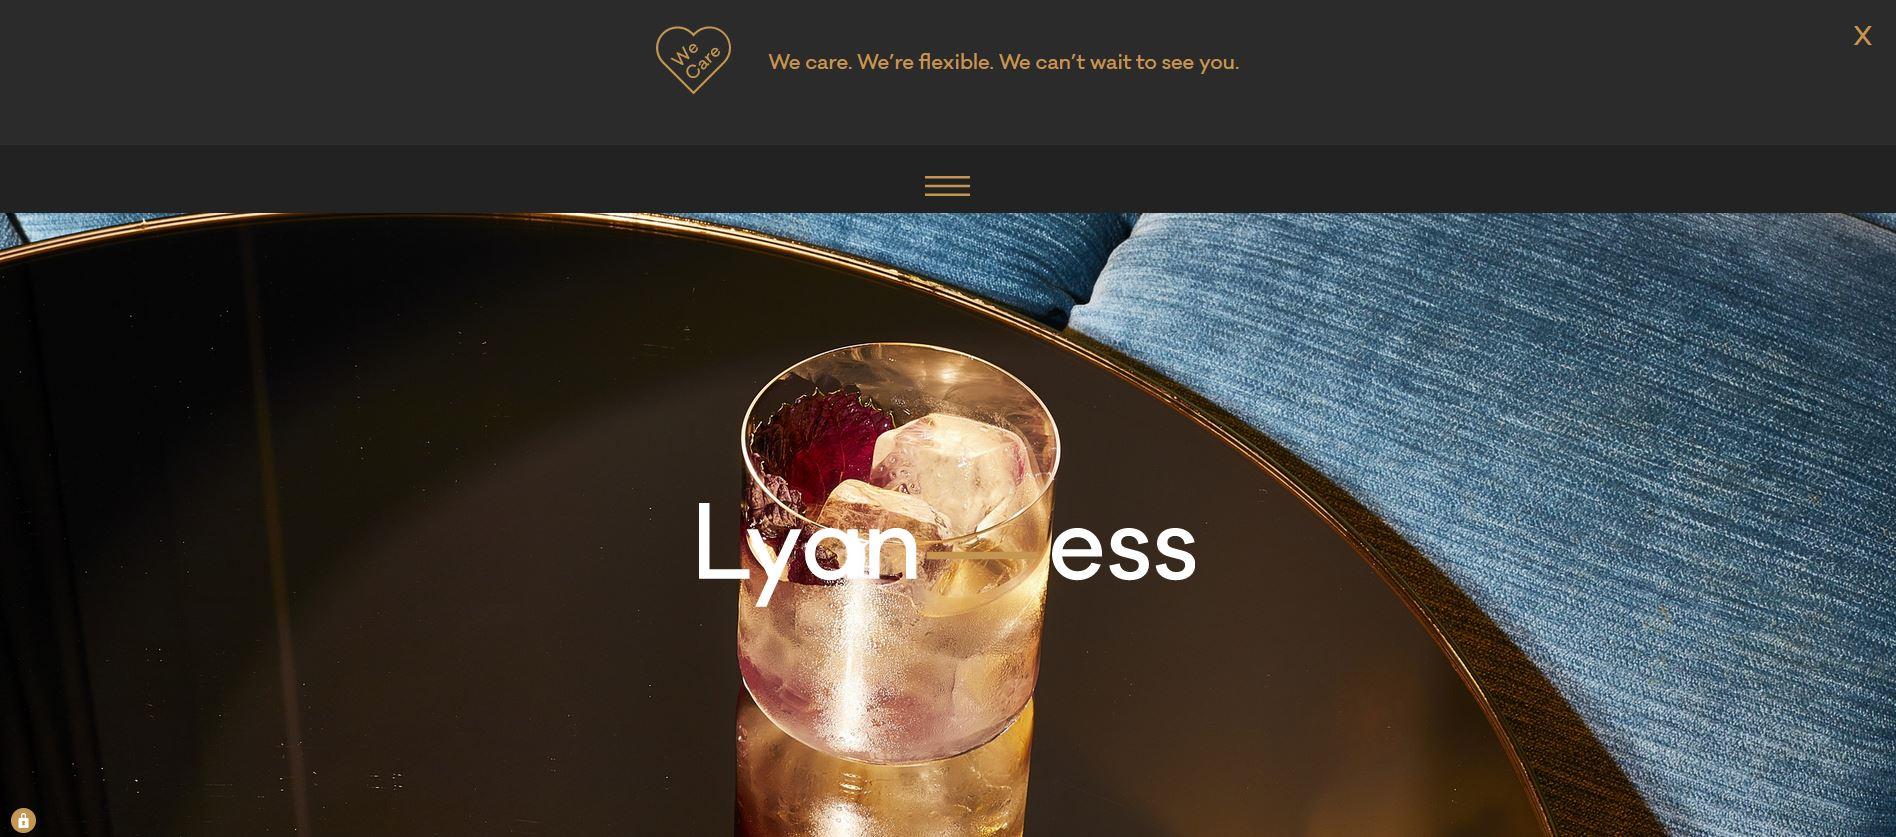 LYONESS, SOUTH BANK